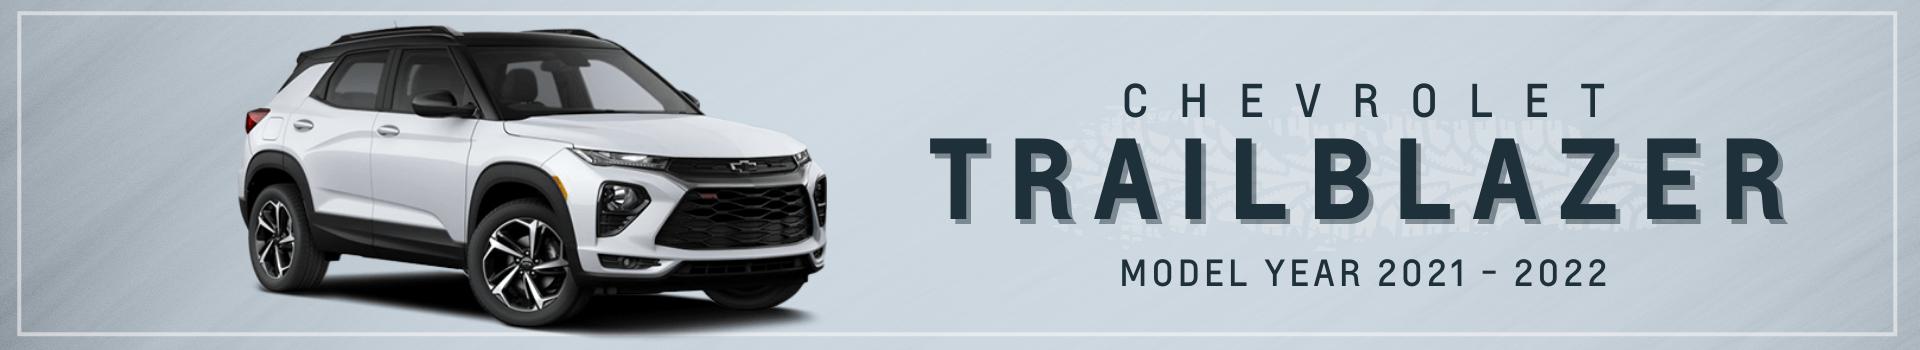 Trailblazer Winter Tire Packages Oshawa